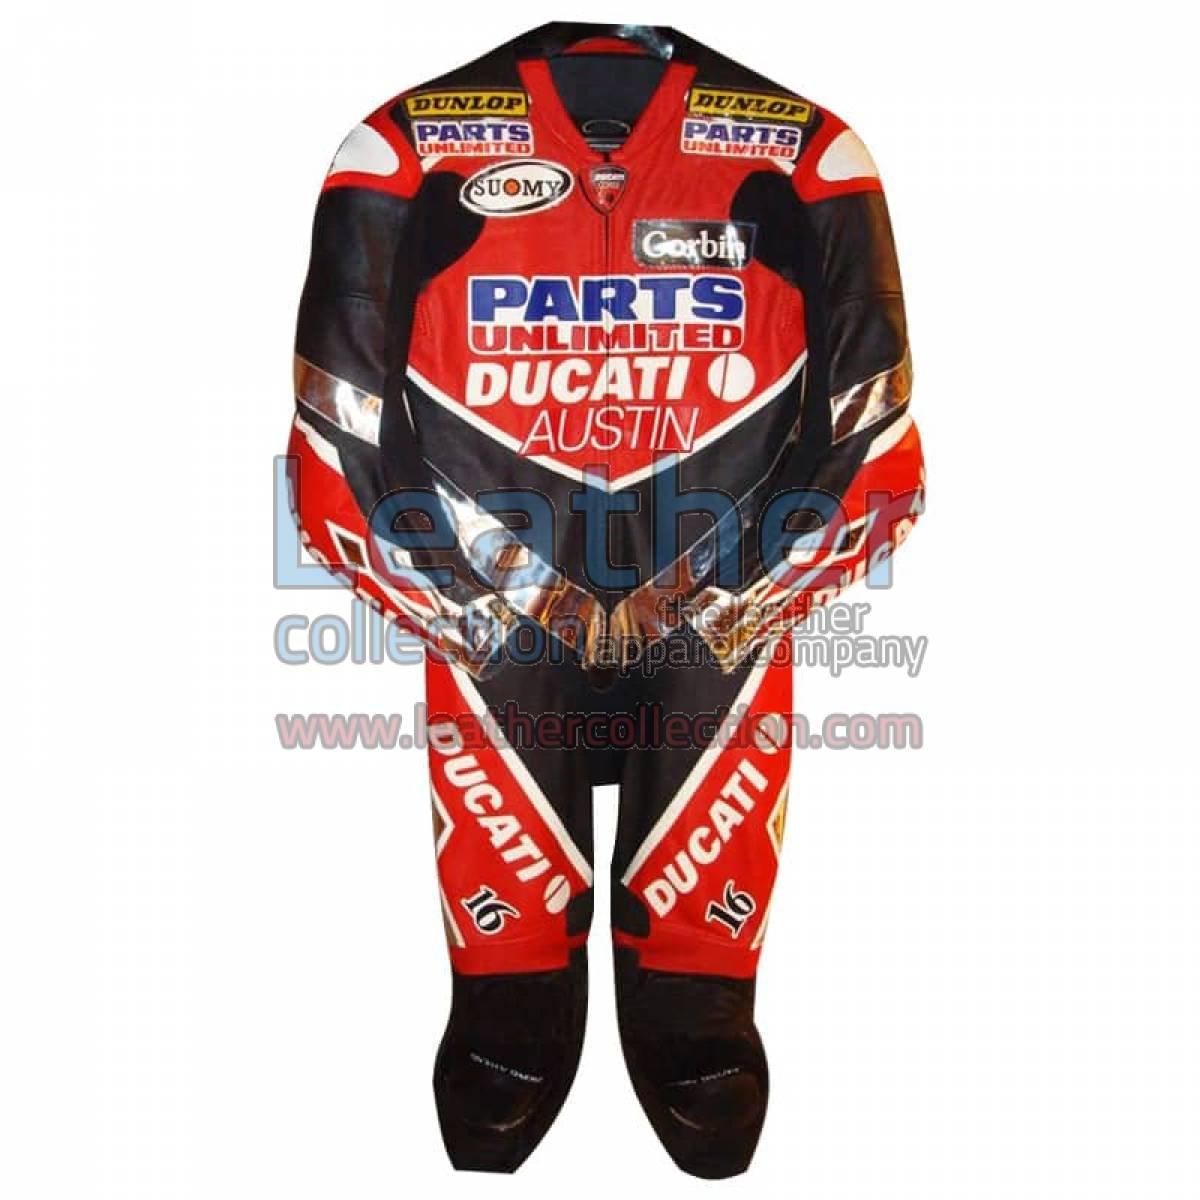 Anthony Gobert Austin Ducati 2003 AMA Race Suit